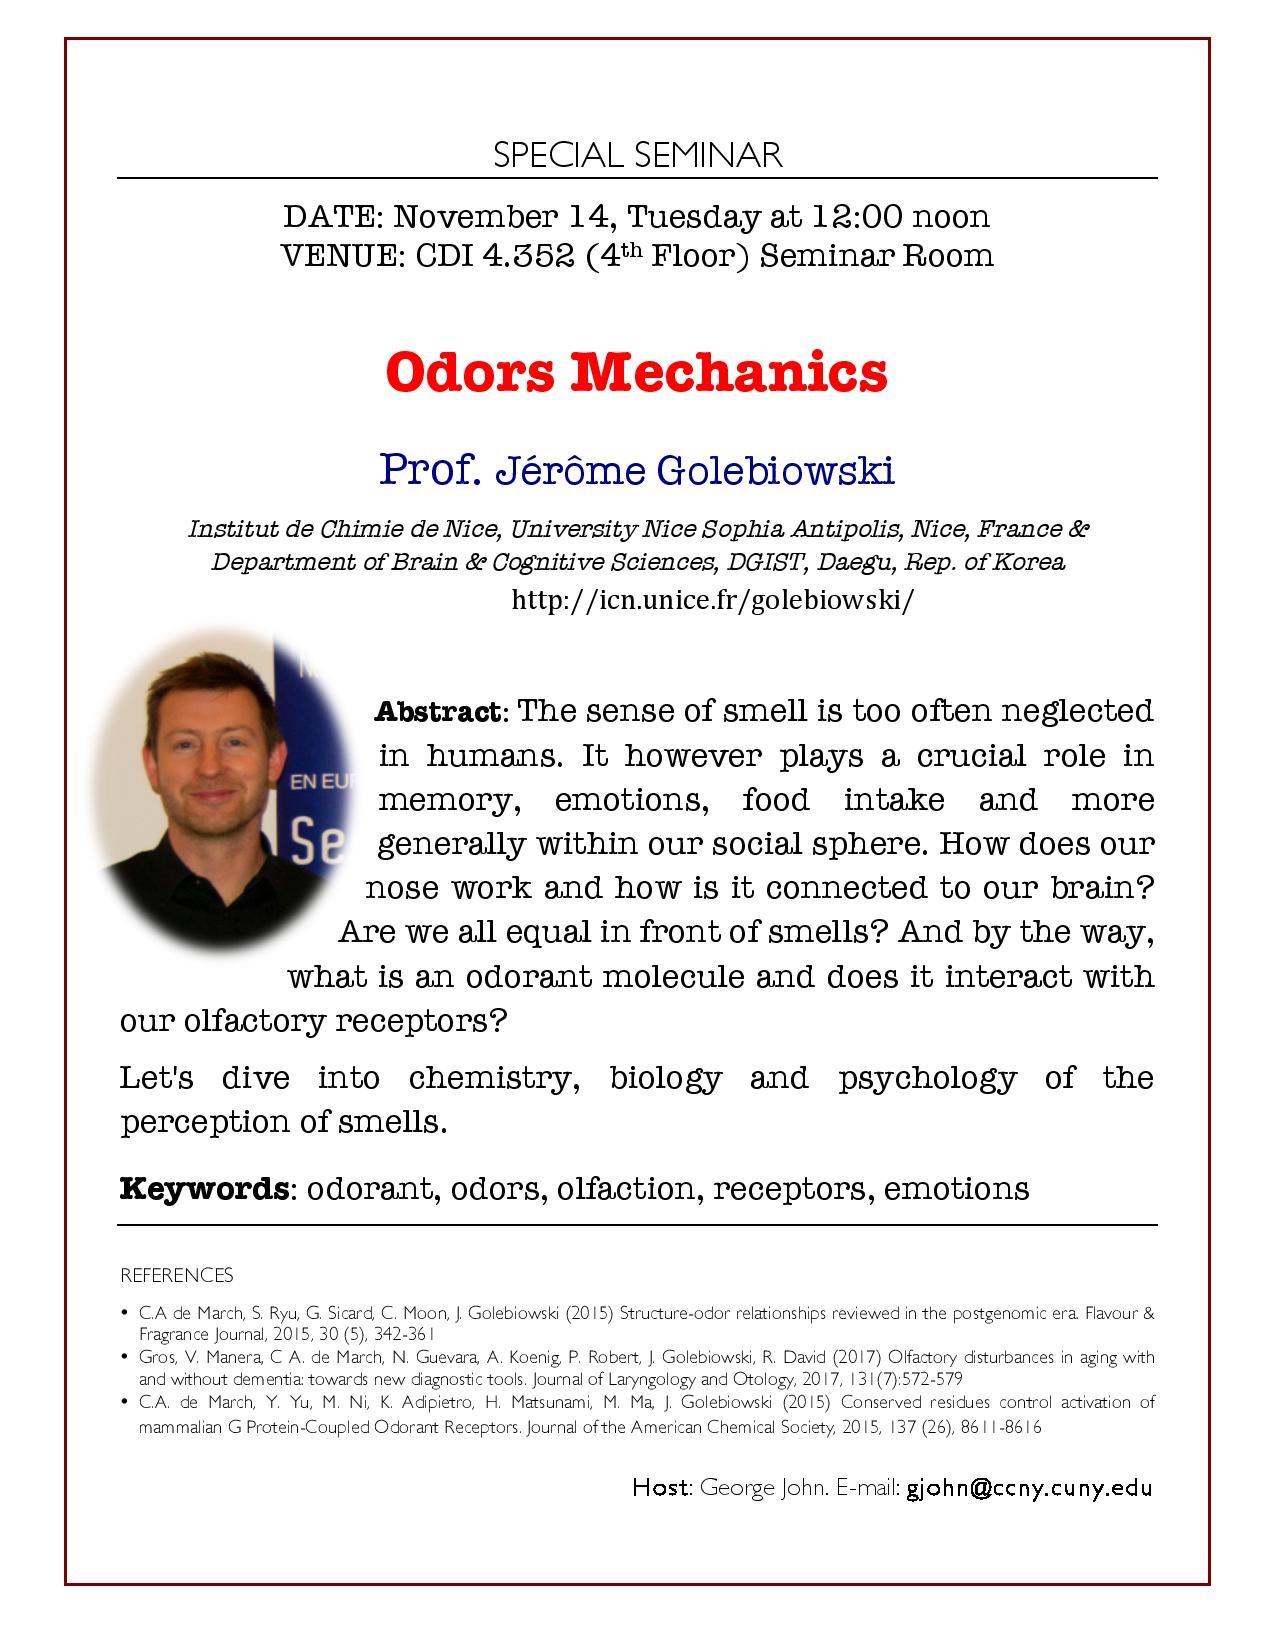 Poster to promote-Odors Mechanics Seminar - Prof. Jérôme Golebiowski, University Nice Sophia Antipolis, Nice, France